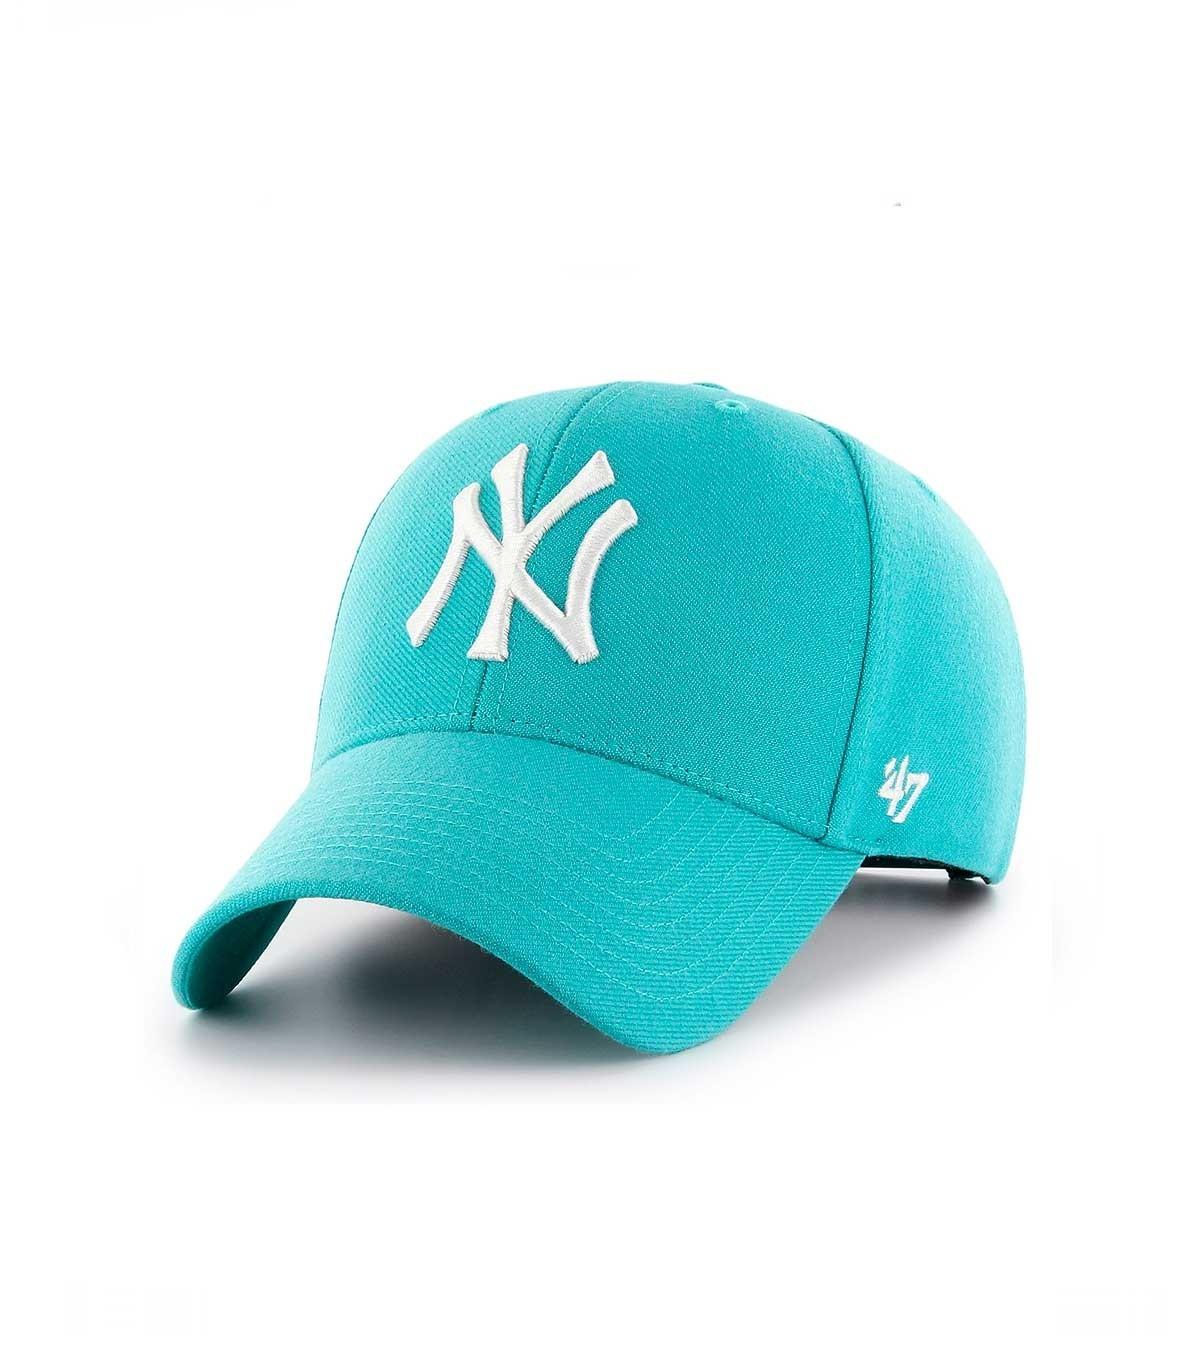 Comprar 47 New York Yankees Gorra  452e3d01939